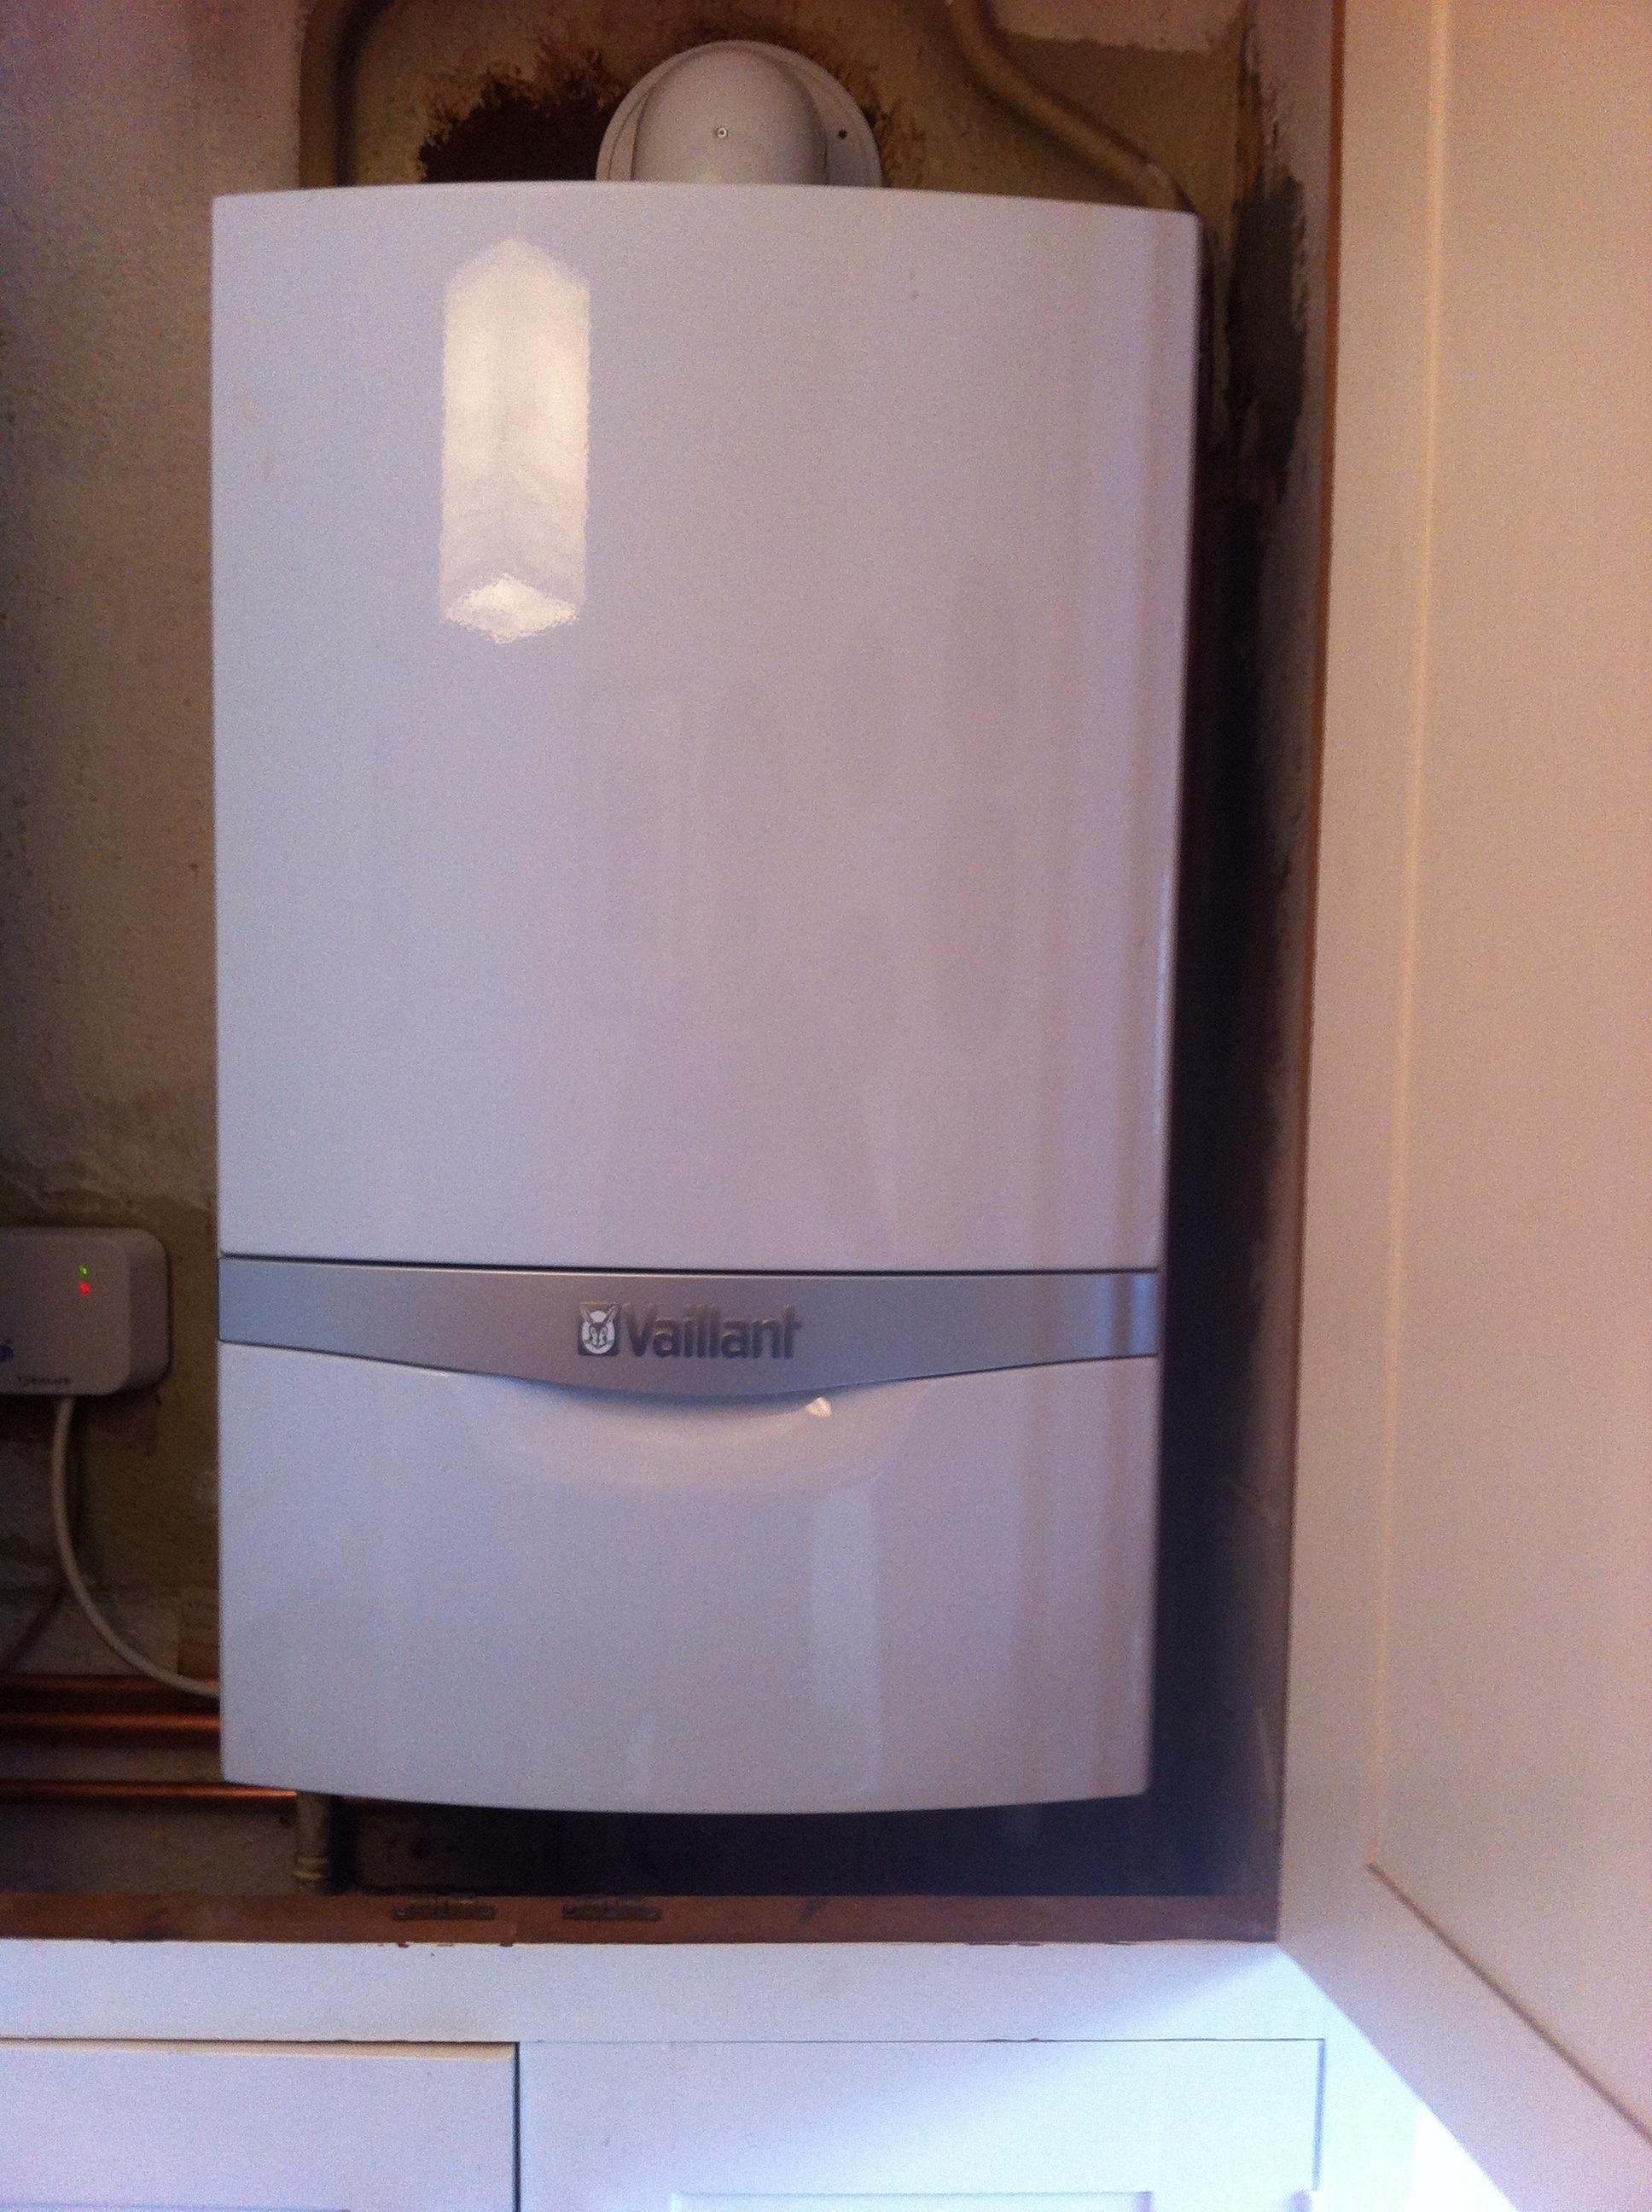 vaillant boiler east london rj gas appliances limited. Black Bedroom Furniture Sets. Home Design Ideas